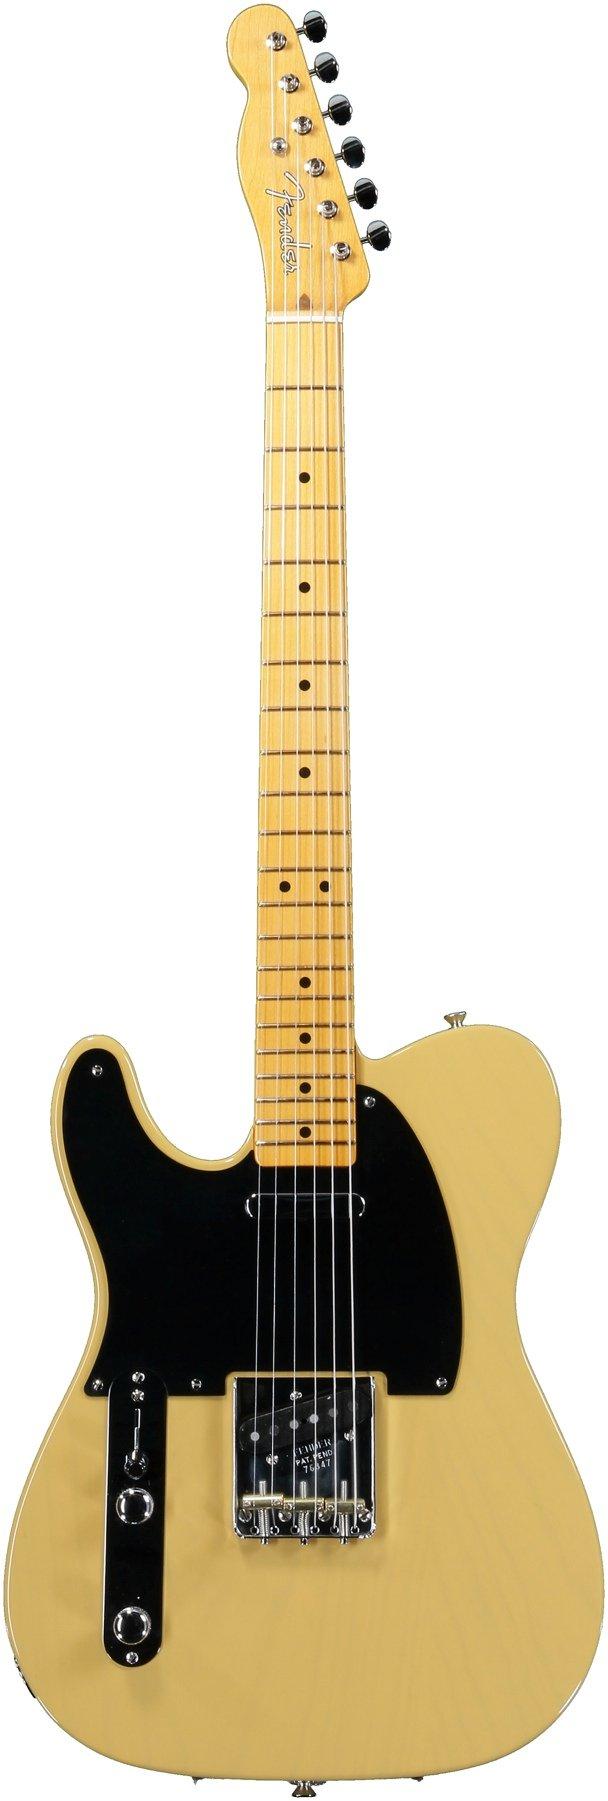 Fender American Vintage 52 Telecaster Left Handed Butterscotch Reissue Wiring Diagram Blonde Image 1